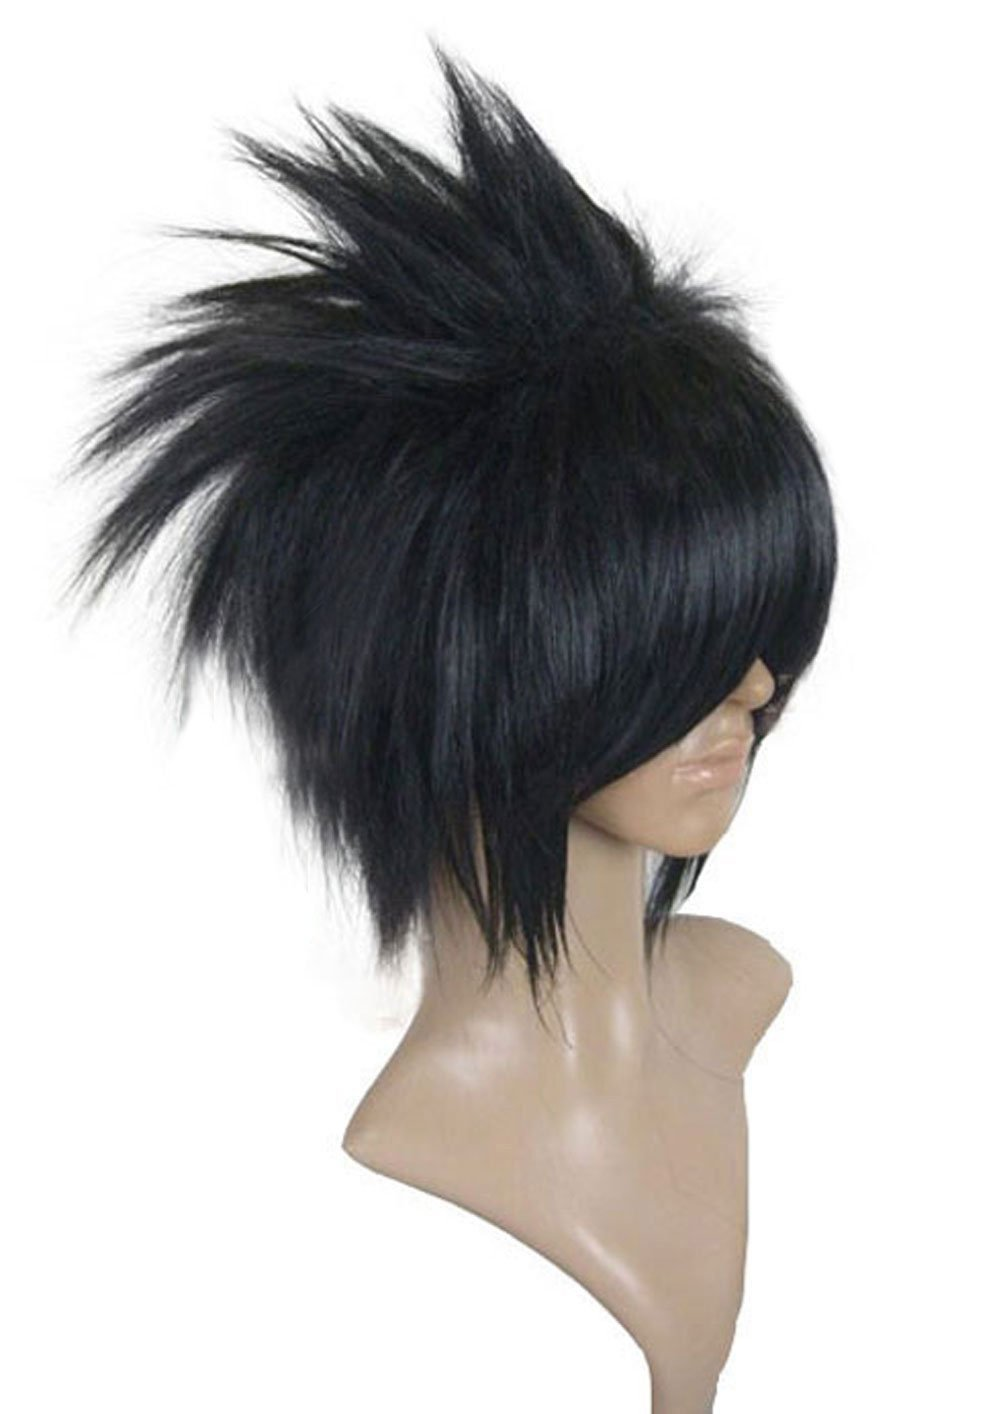 Naruto Sasuke Uchiha Free Track NO need style Anime Costume Cosplay Wig